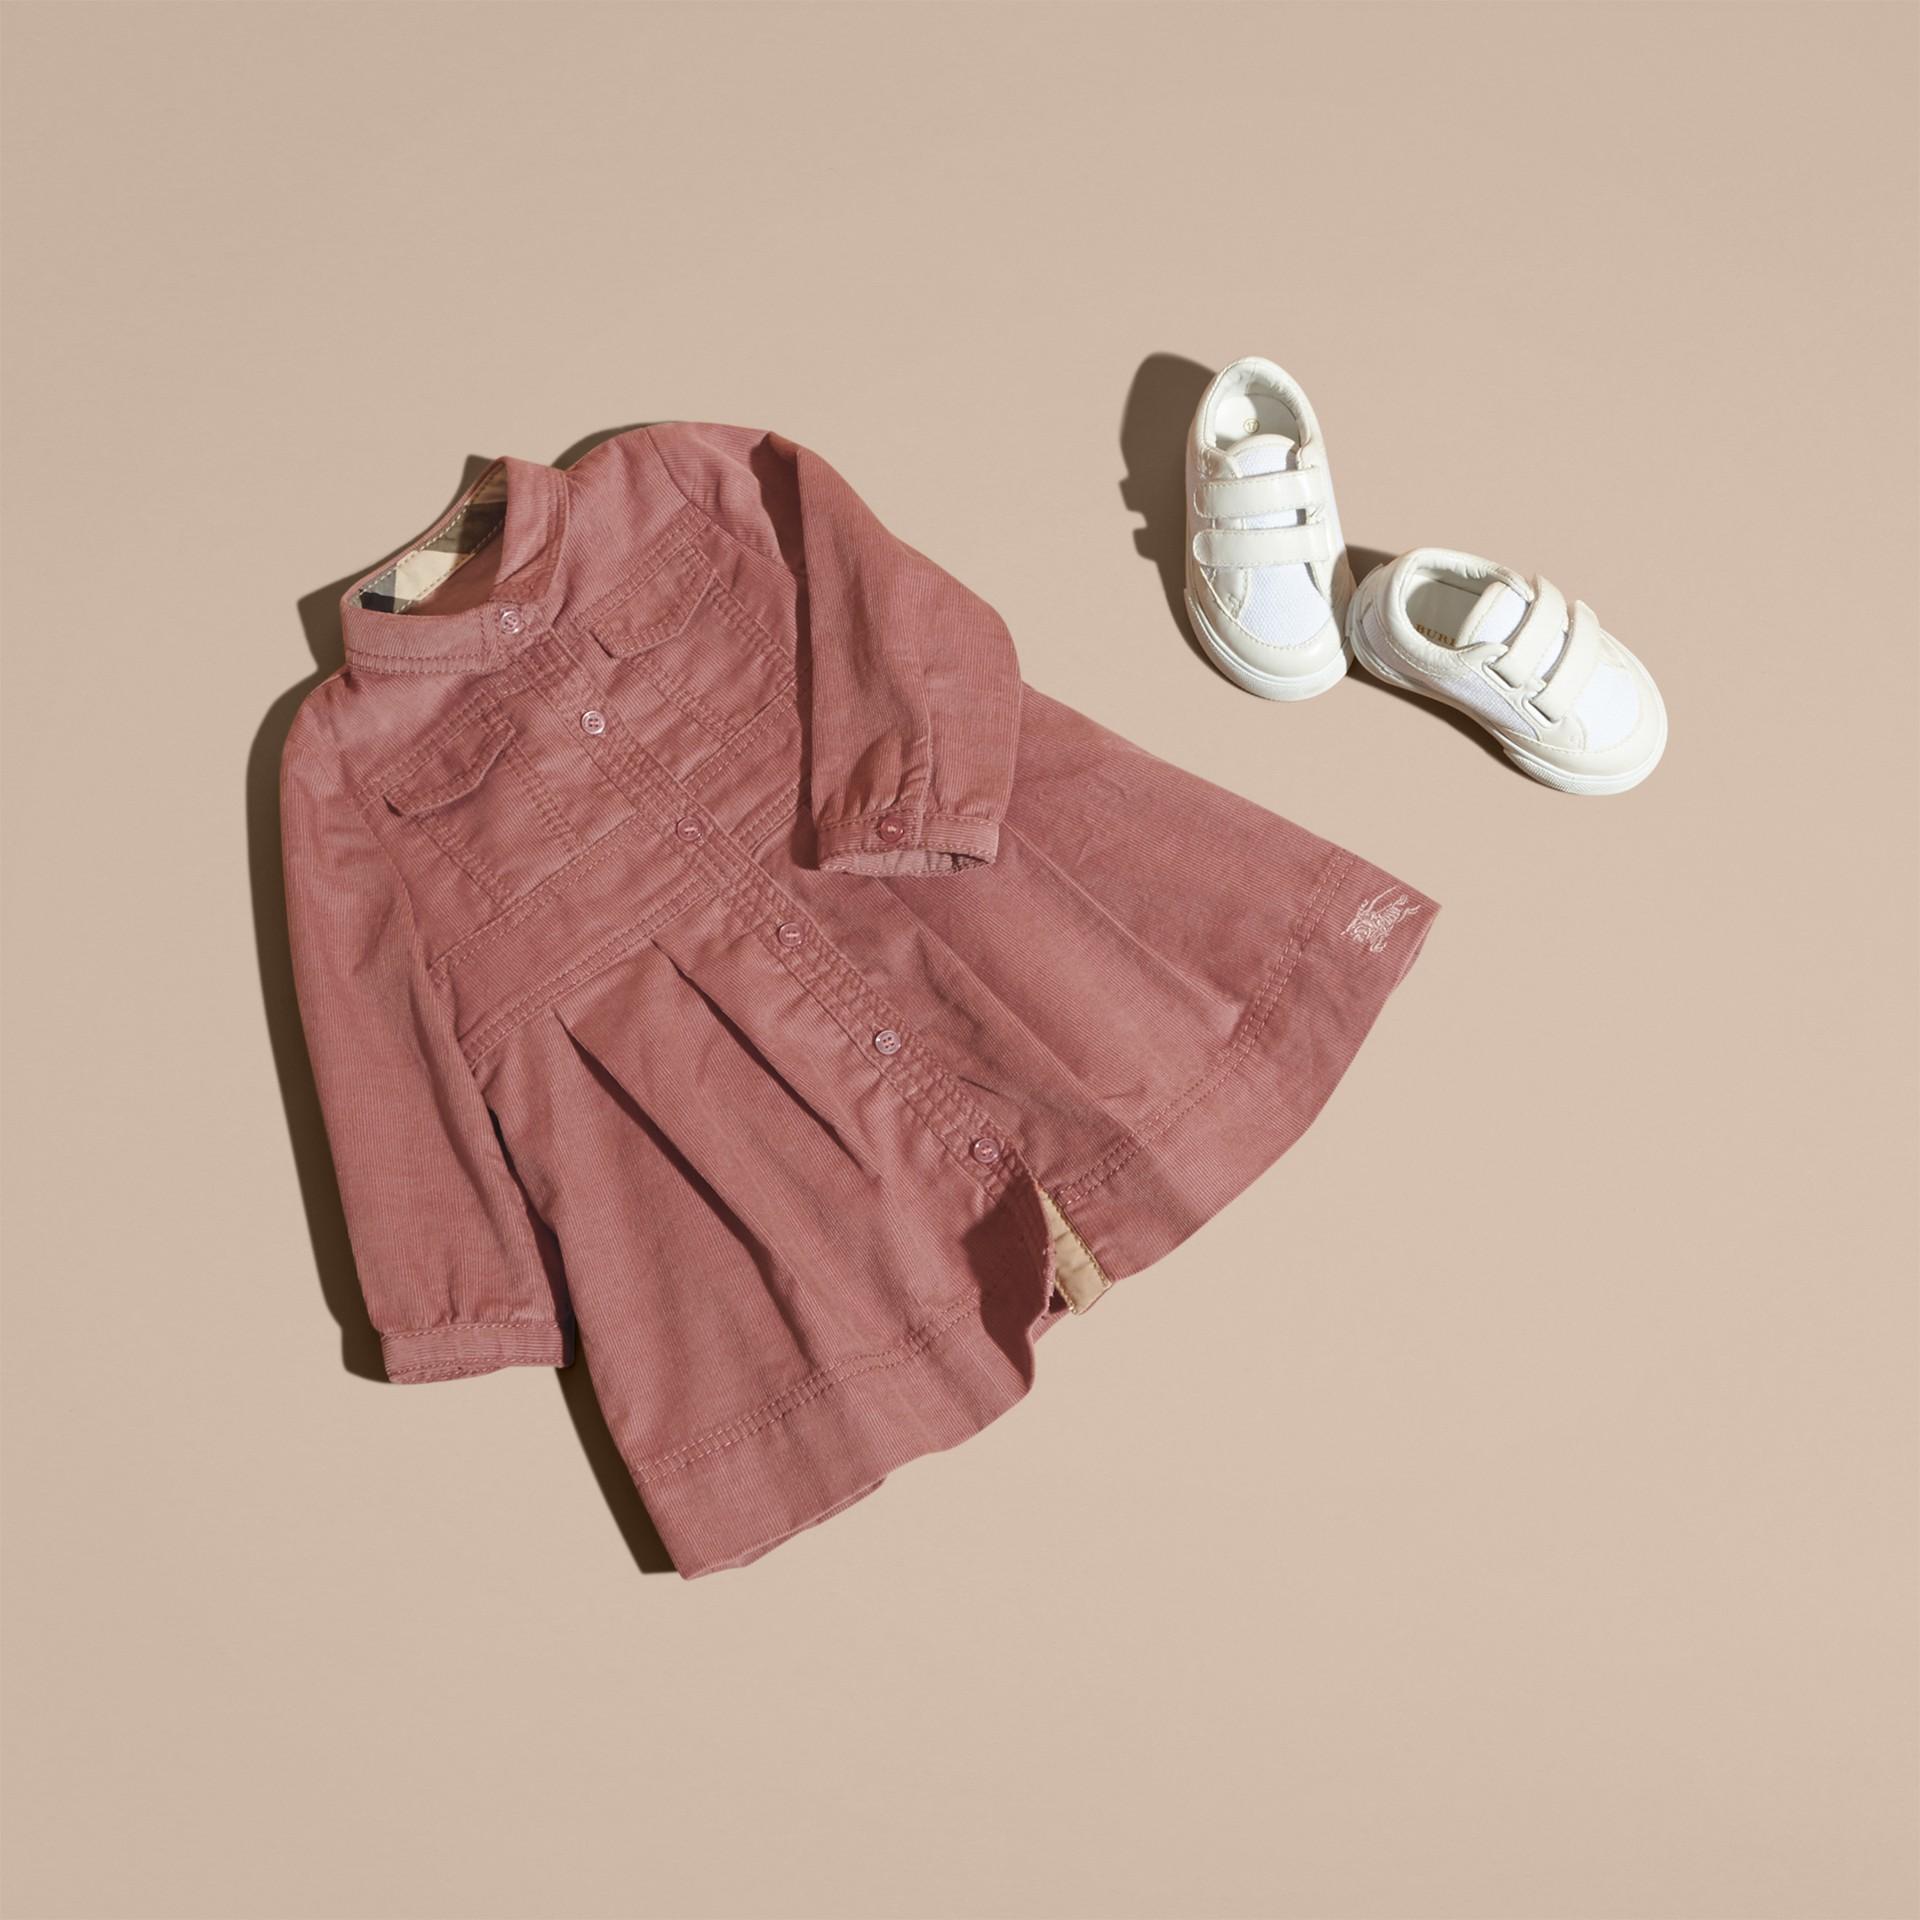 Helles aschrosa Hemdkleid aus Baumwollcord Helles Aschrosa - Galerie-Bild 5